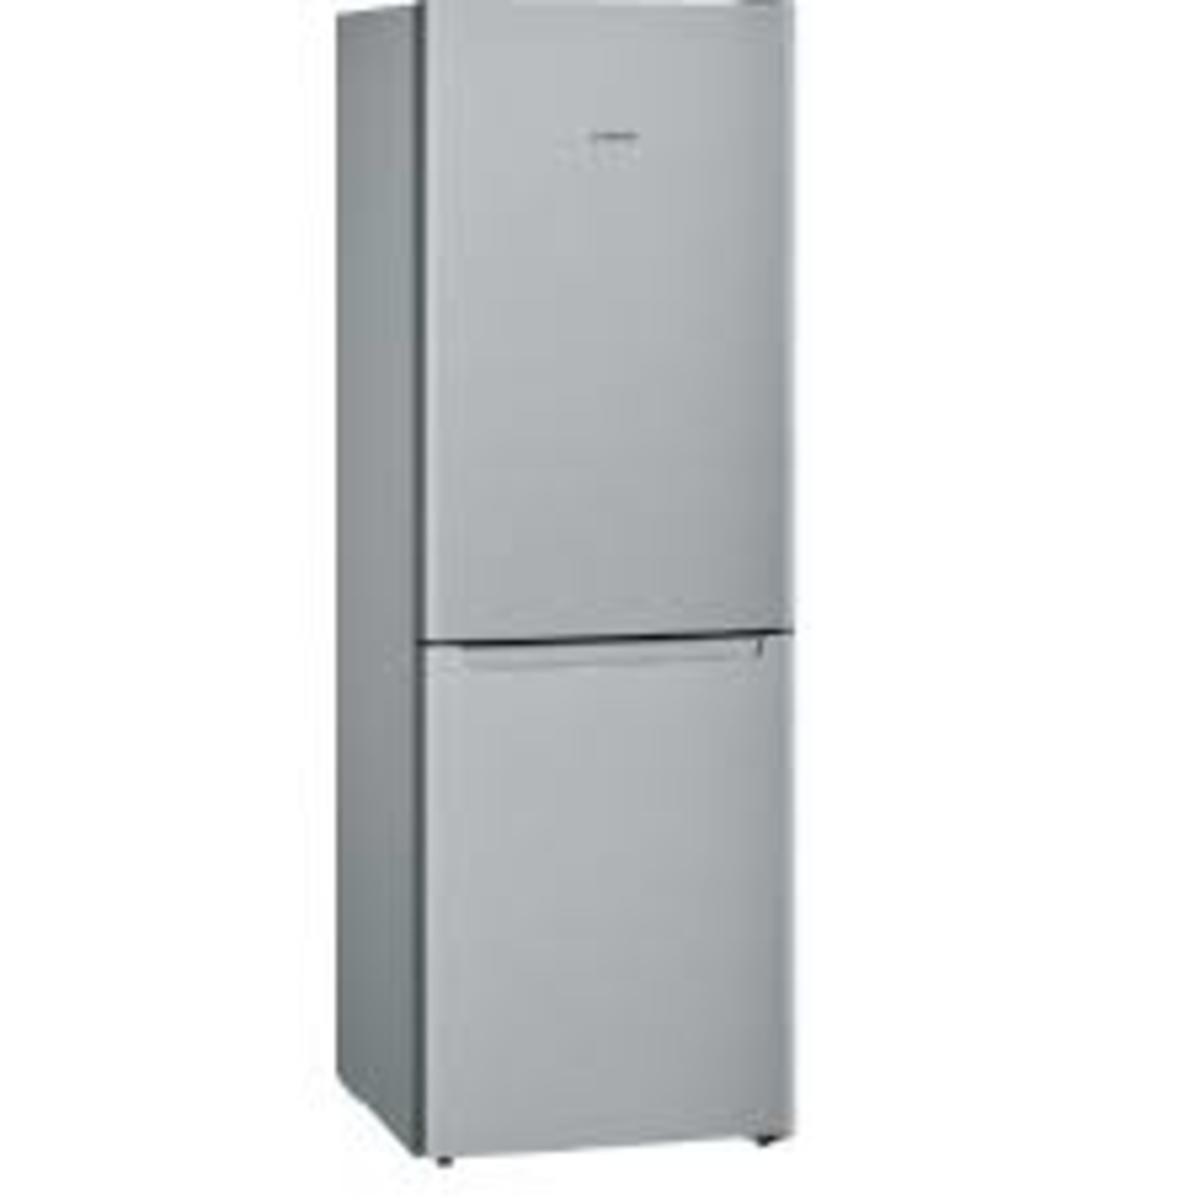 KG33NNL30K 279公升 iQ100 下層冷凍式 雙門雪櫃